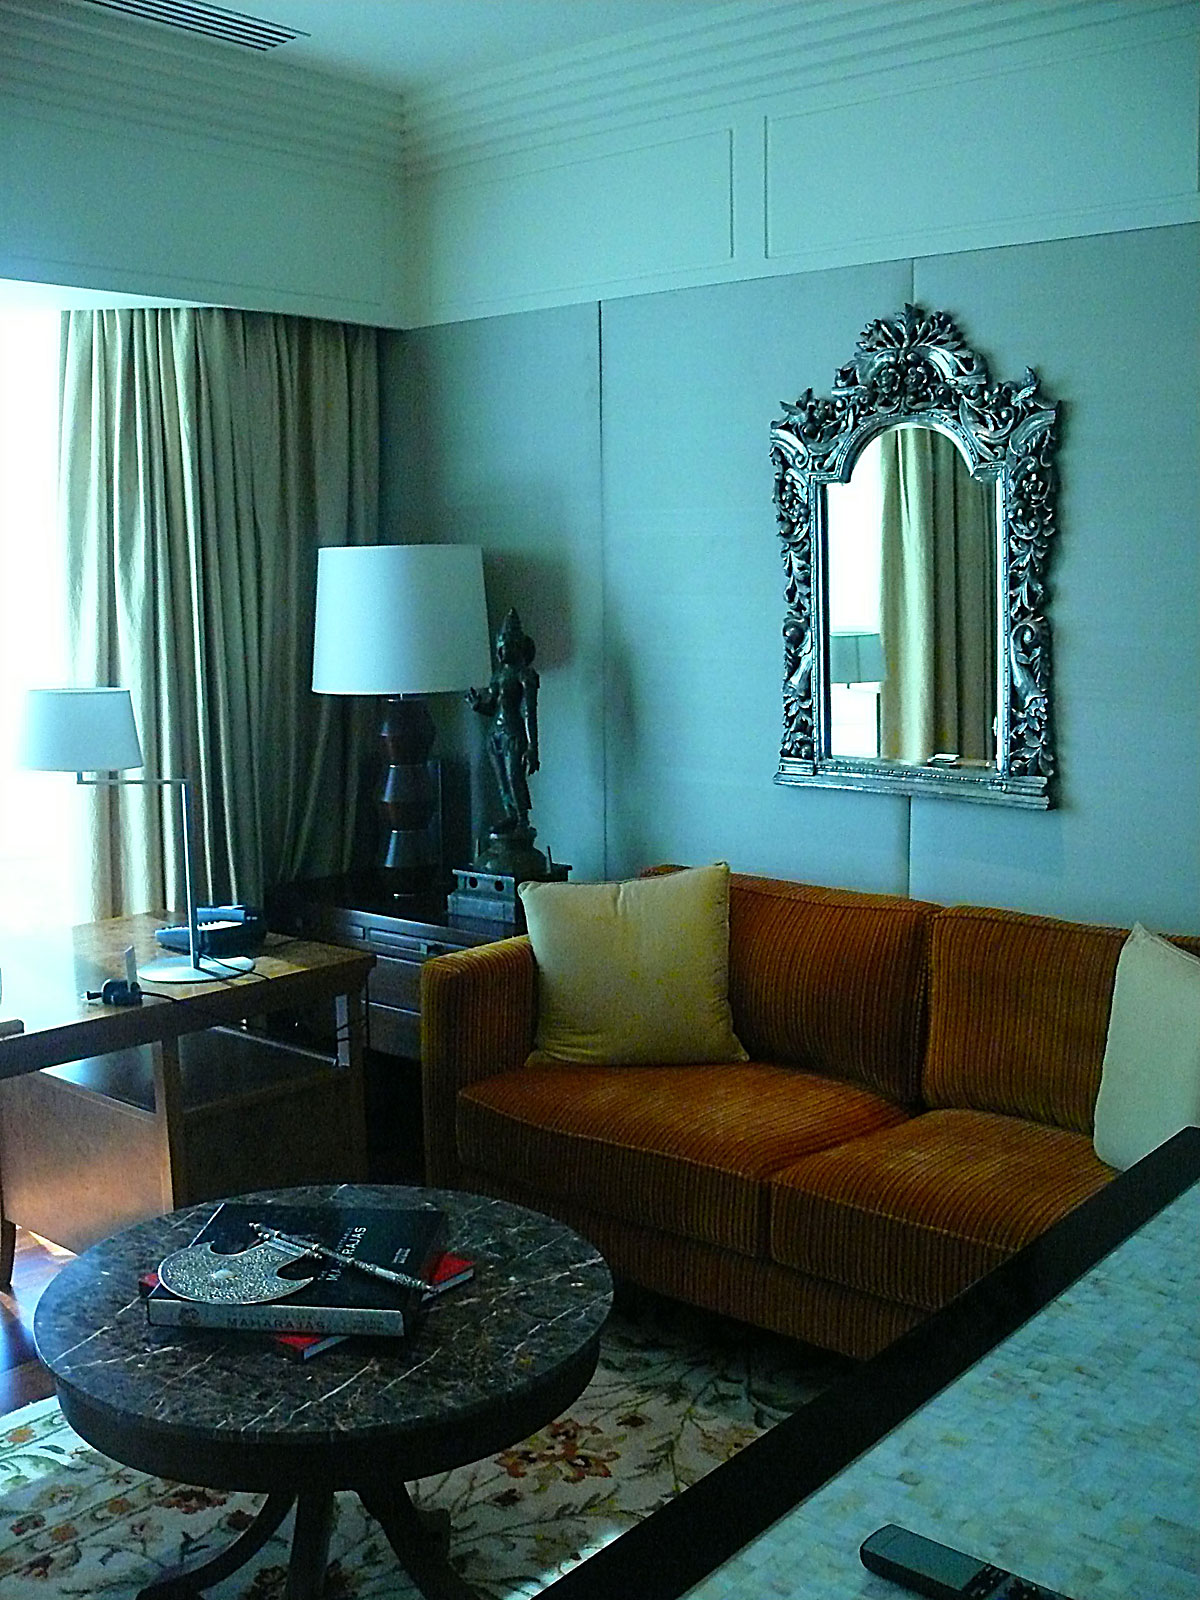 INDIEN MUMBAI Hotel The Leela FINEST-onTour P1030640.jpg